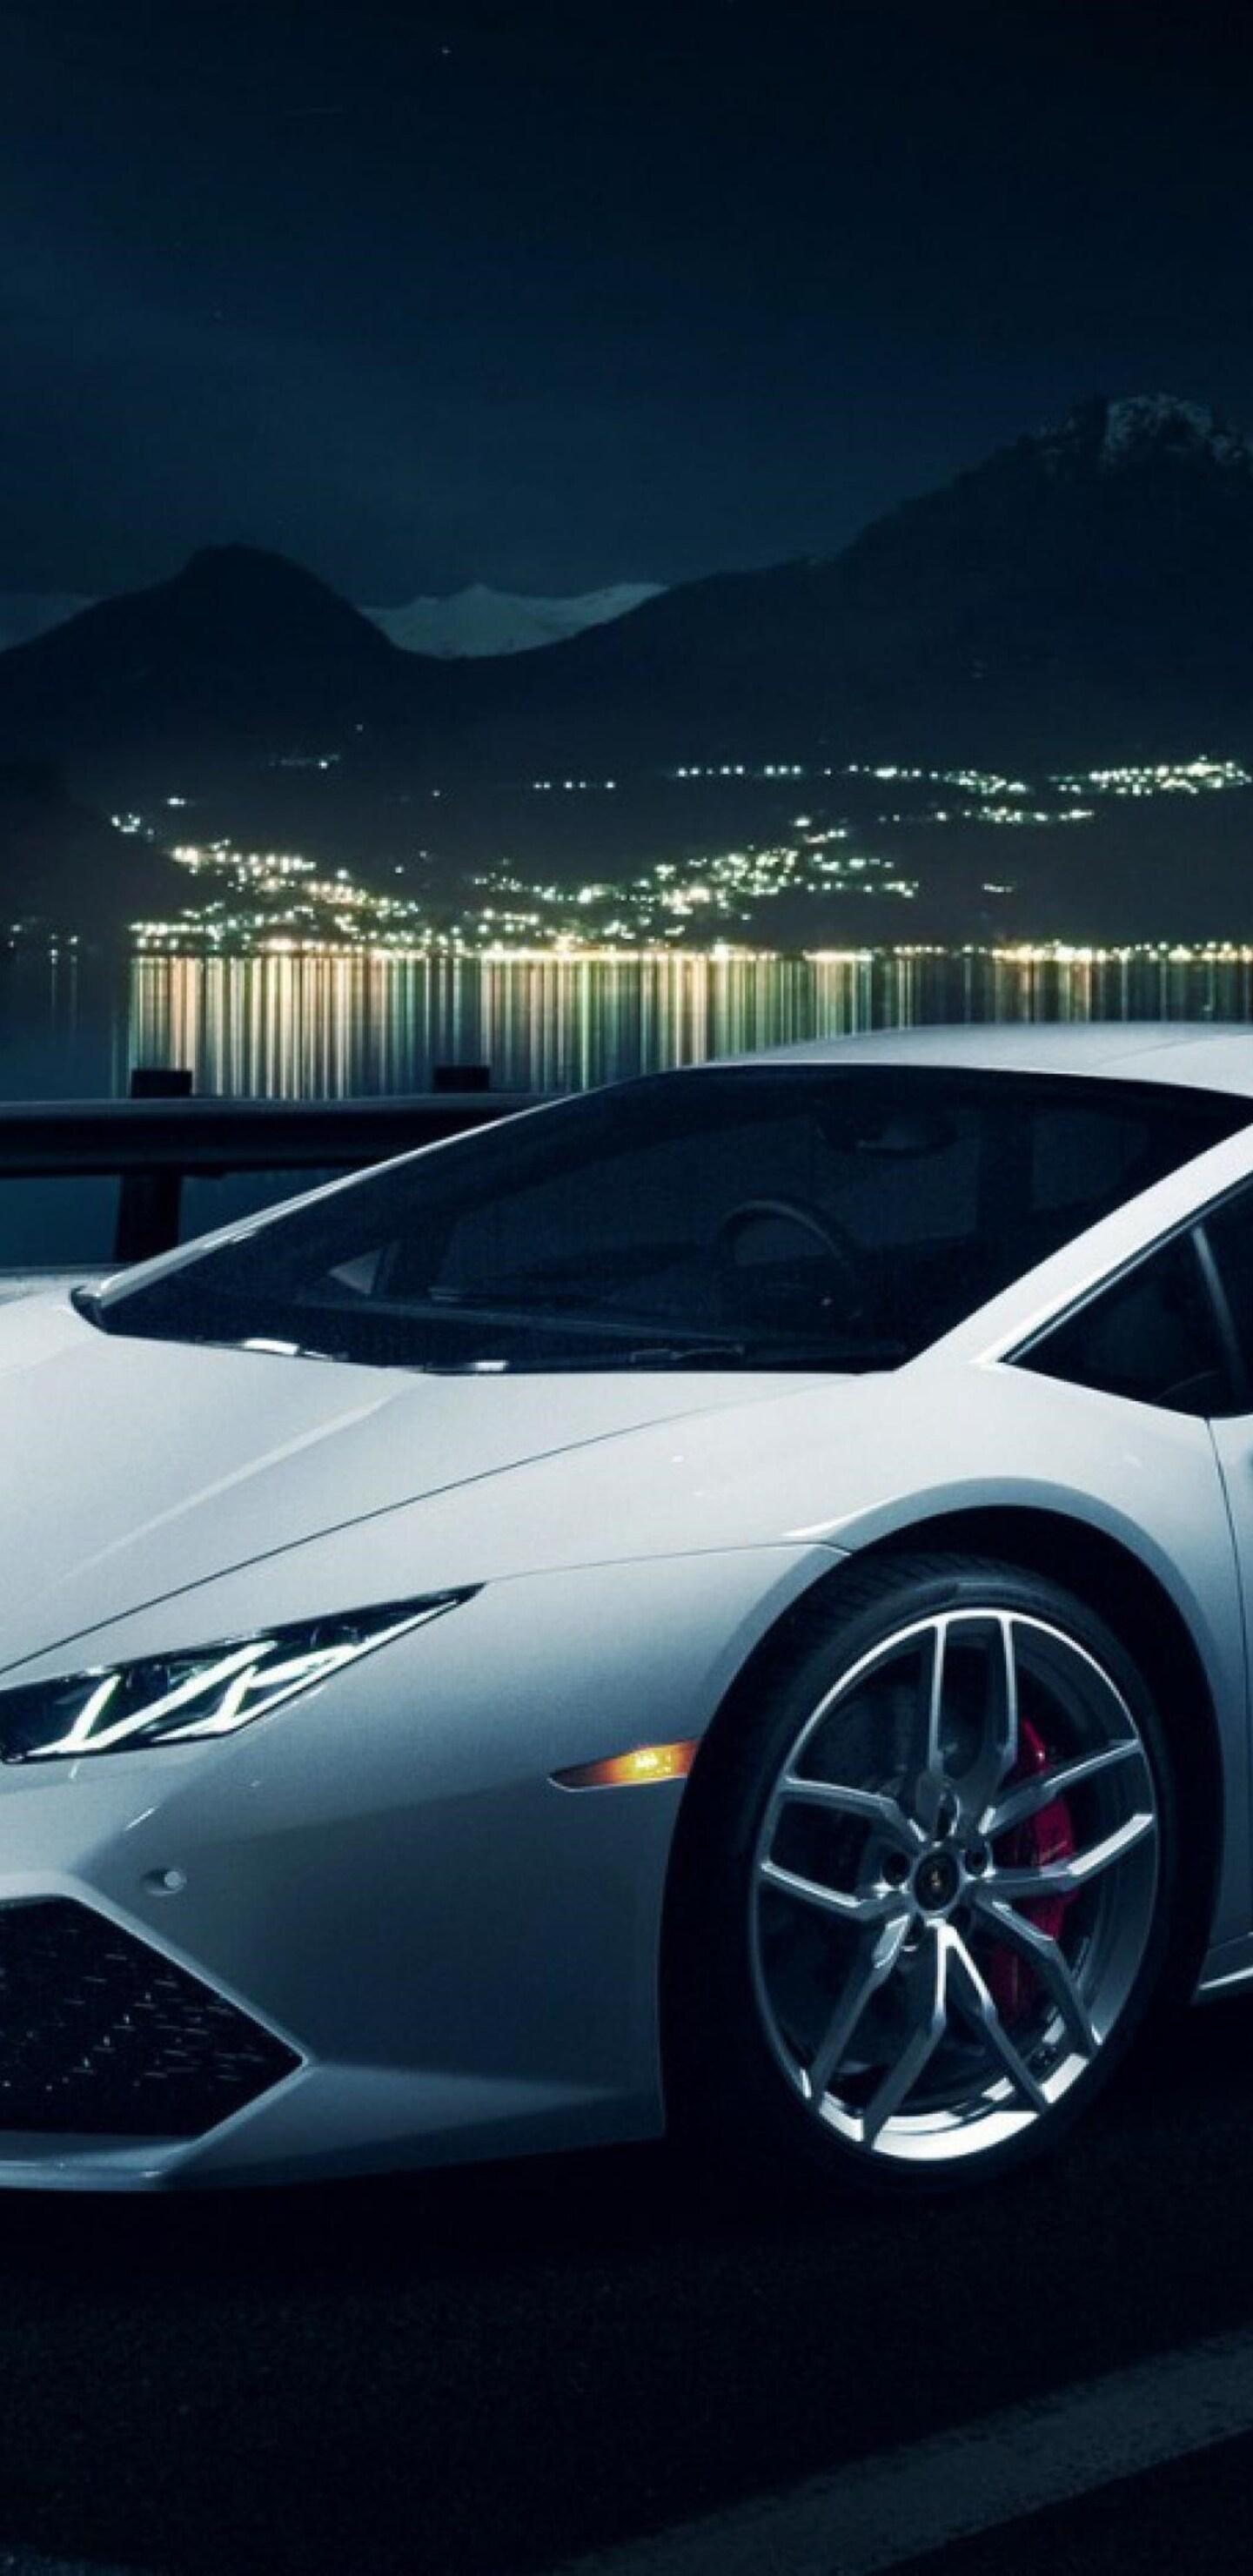 1440x2960 Lamborghini Huracan Hd Samsung Galaxy Note 9 8 S9 S8 S8